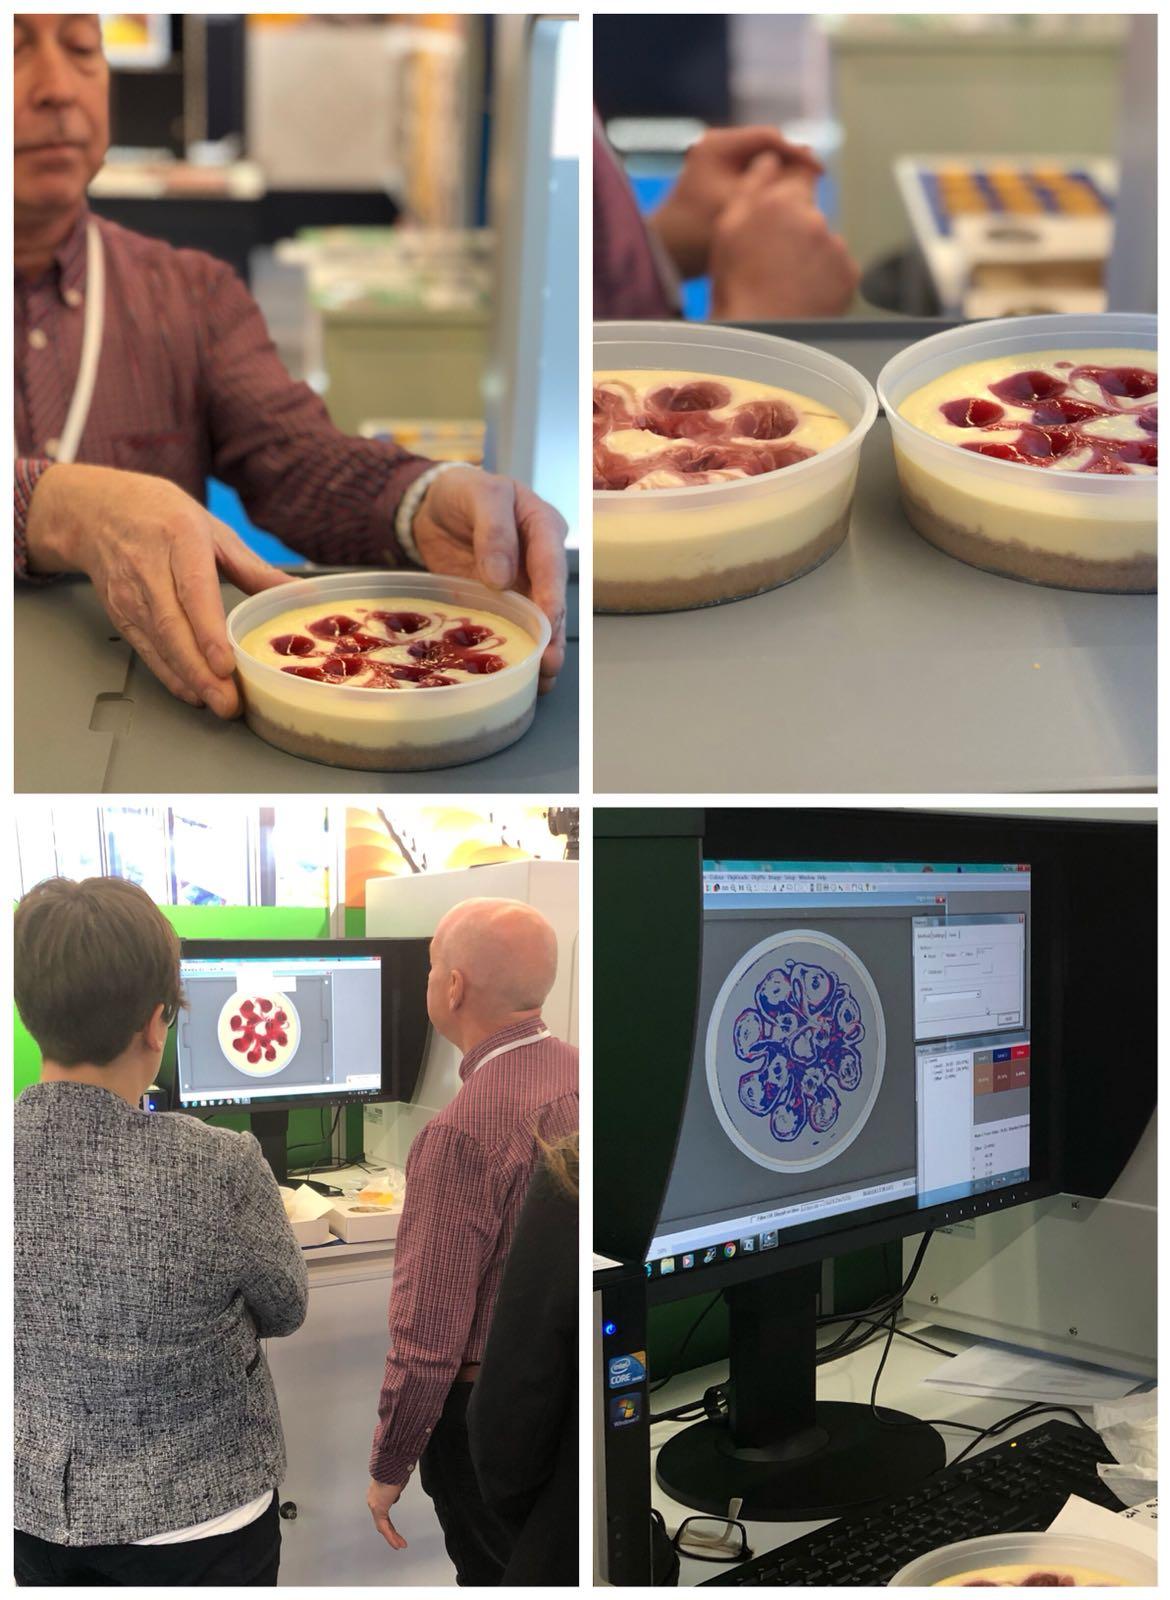 cheesecake digieye measurement samples